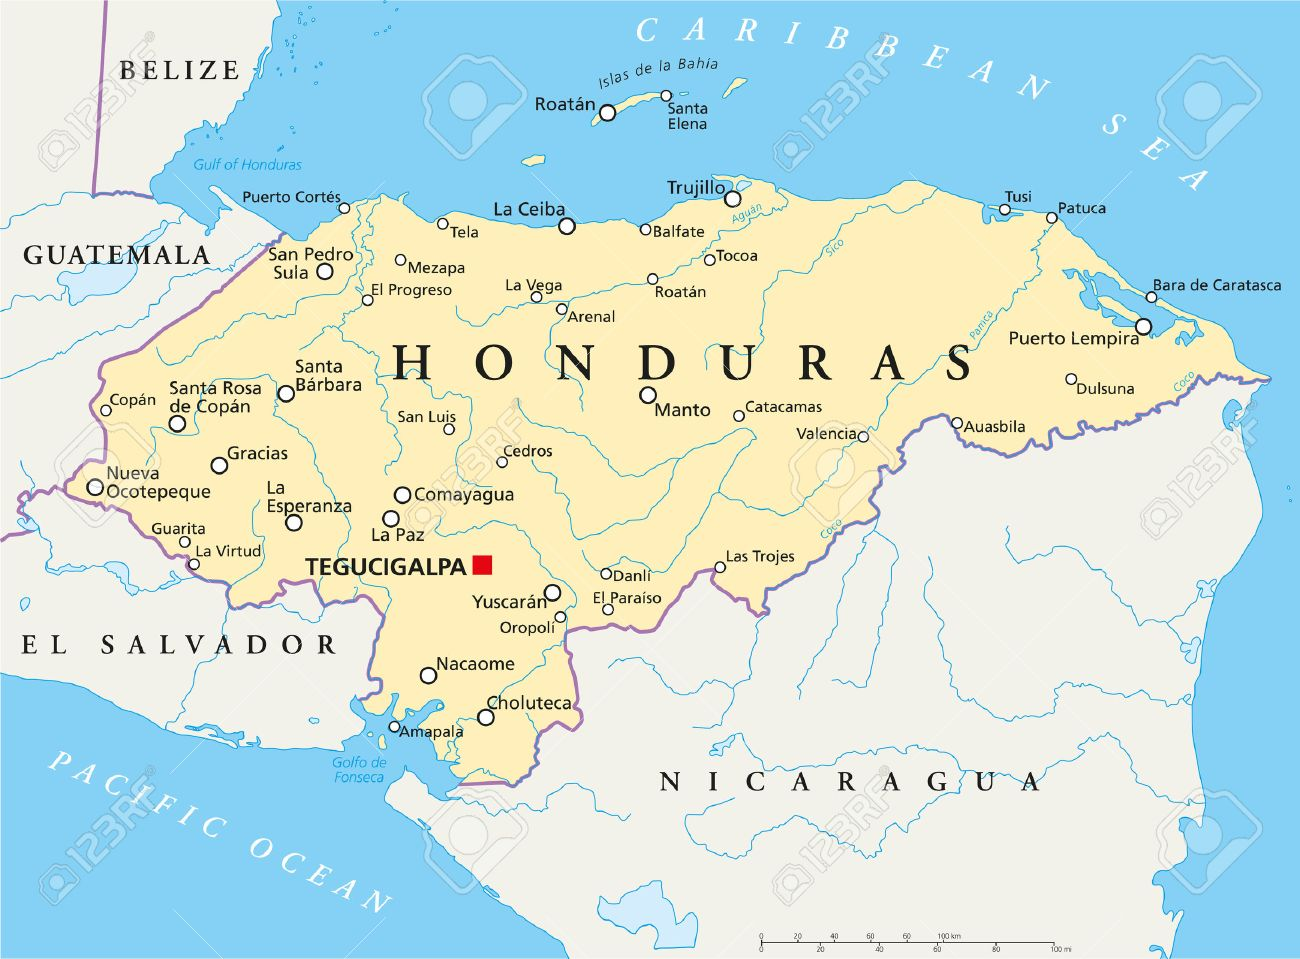 Honduras Political Map With Capital Tegucigalpa With National